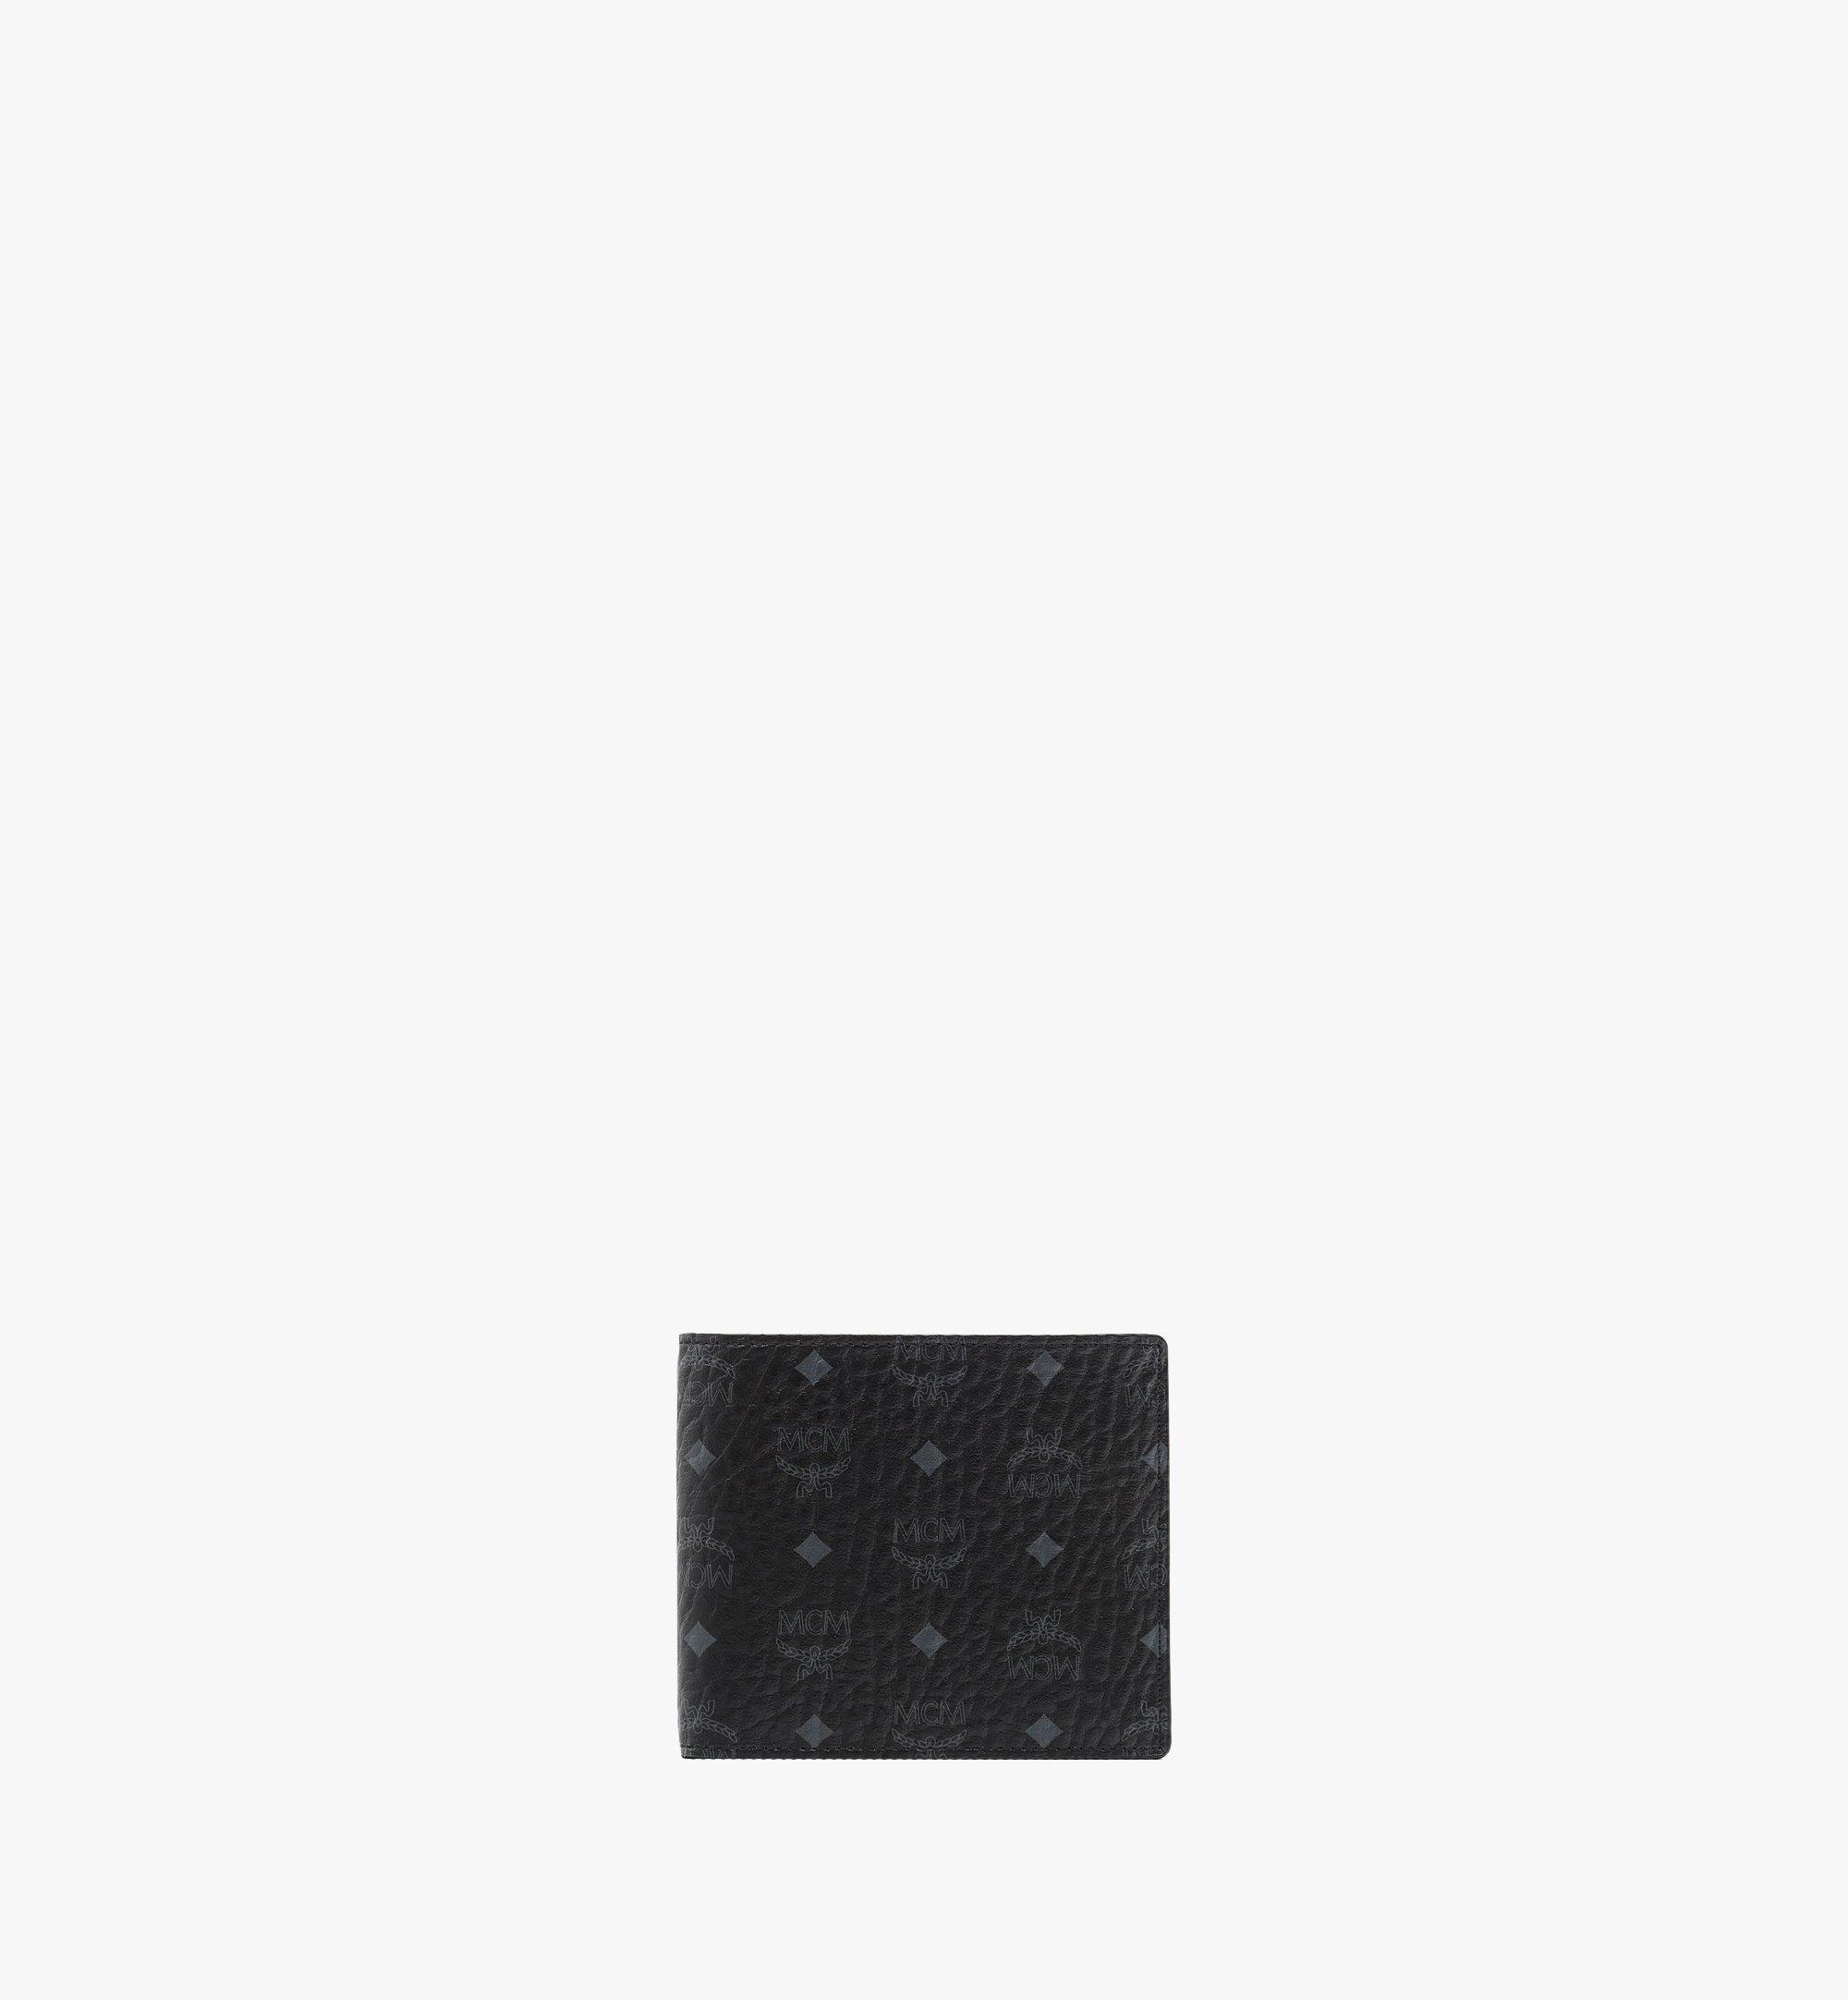 MCM Bifold Wallet in Visetos Original Black MXS8SVI63BK001 Alternate View 1